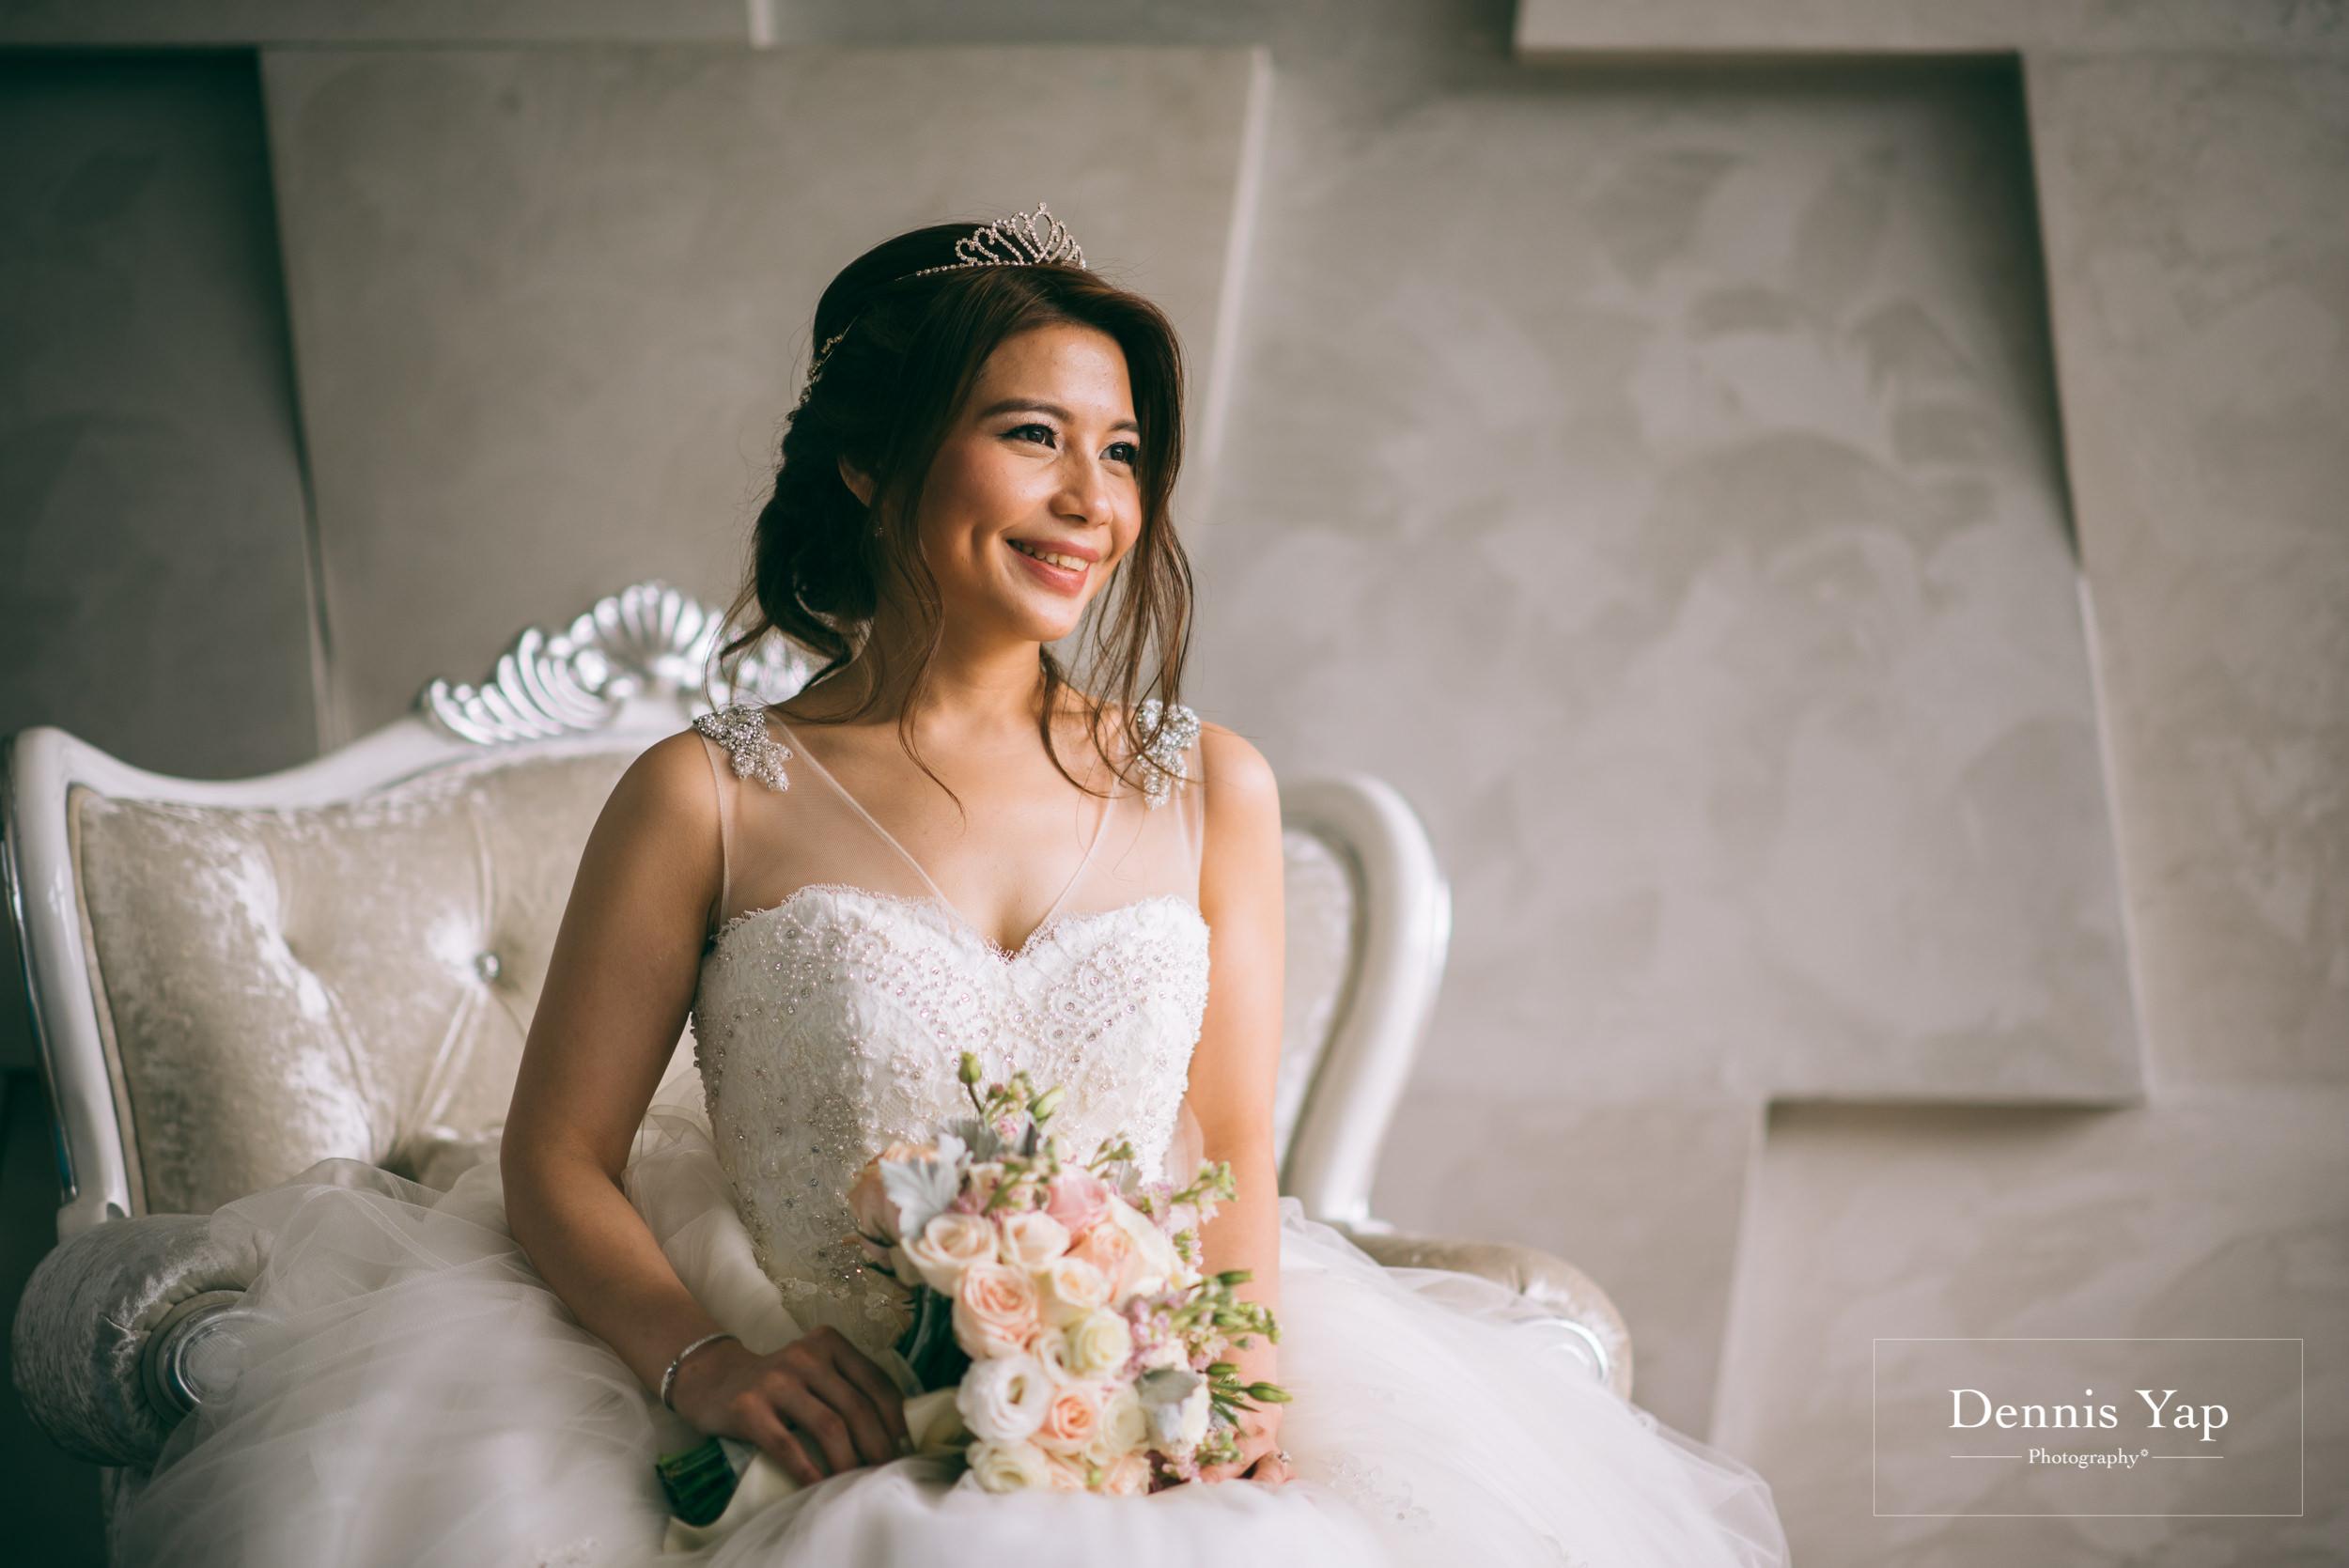 pung doris pre wedding desa park dennis yap photography-22.jpg